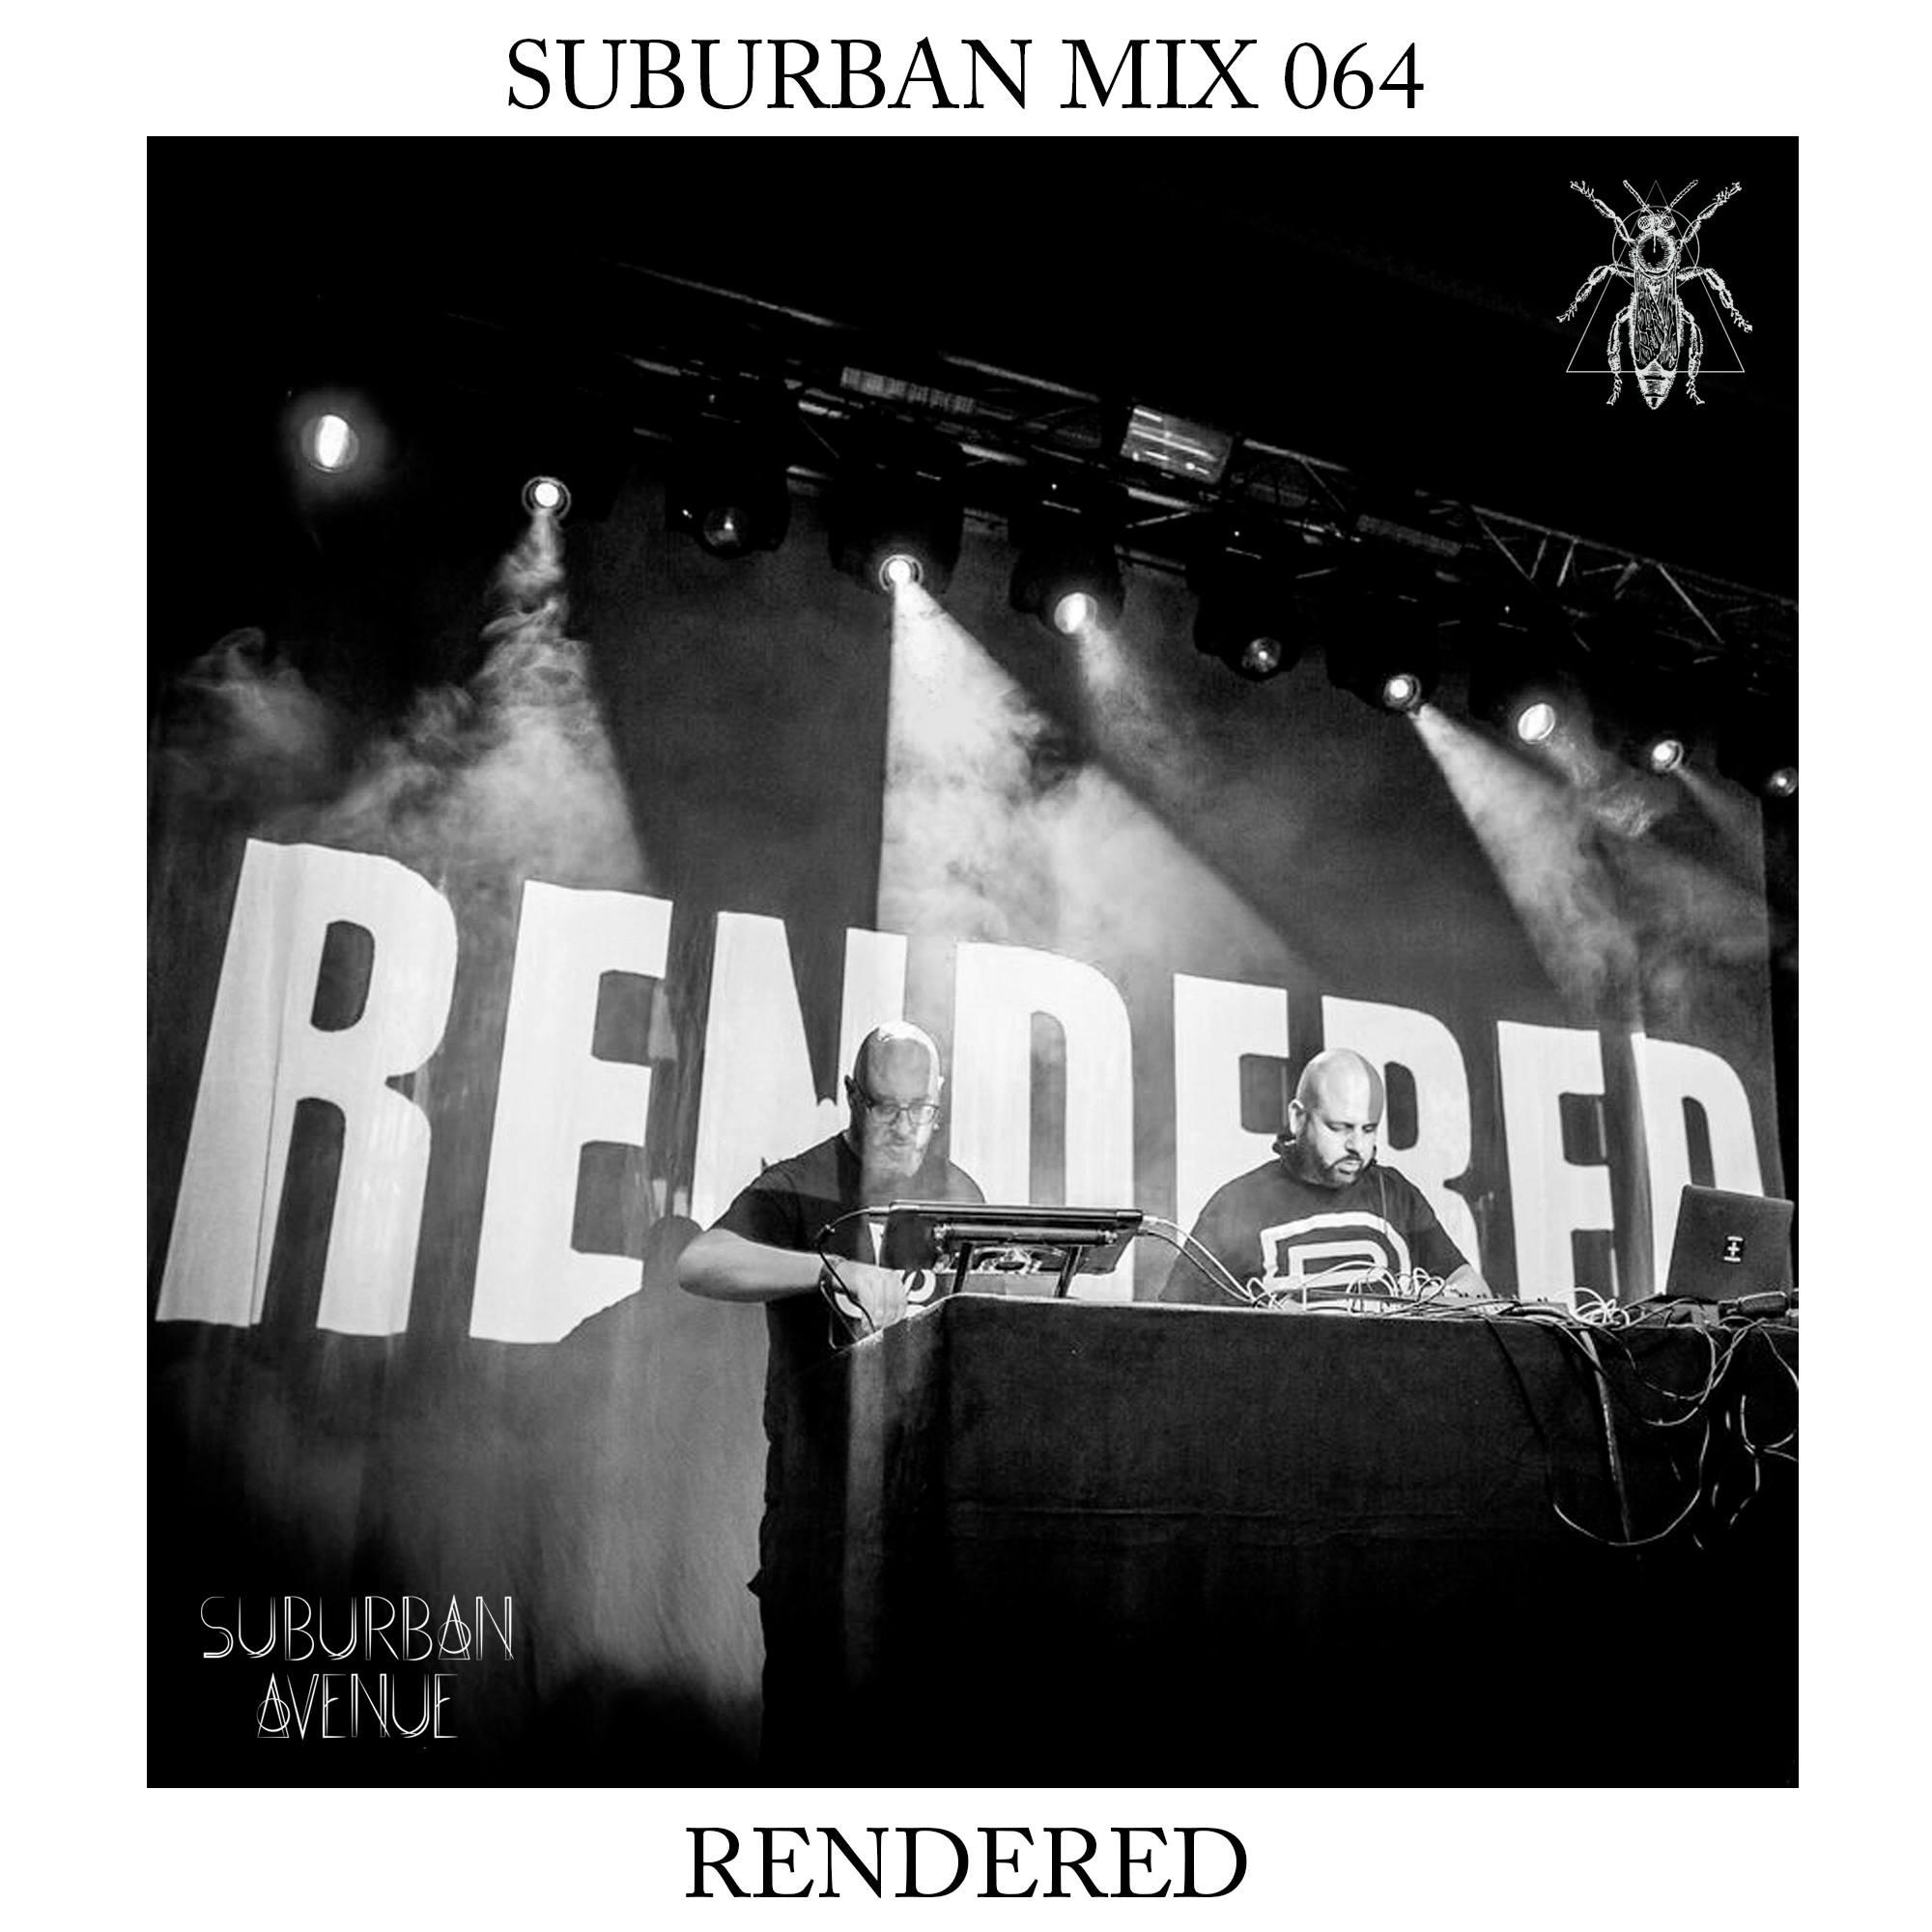 Suburban Mix 064 - Rendered